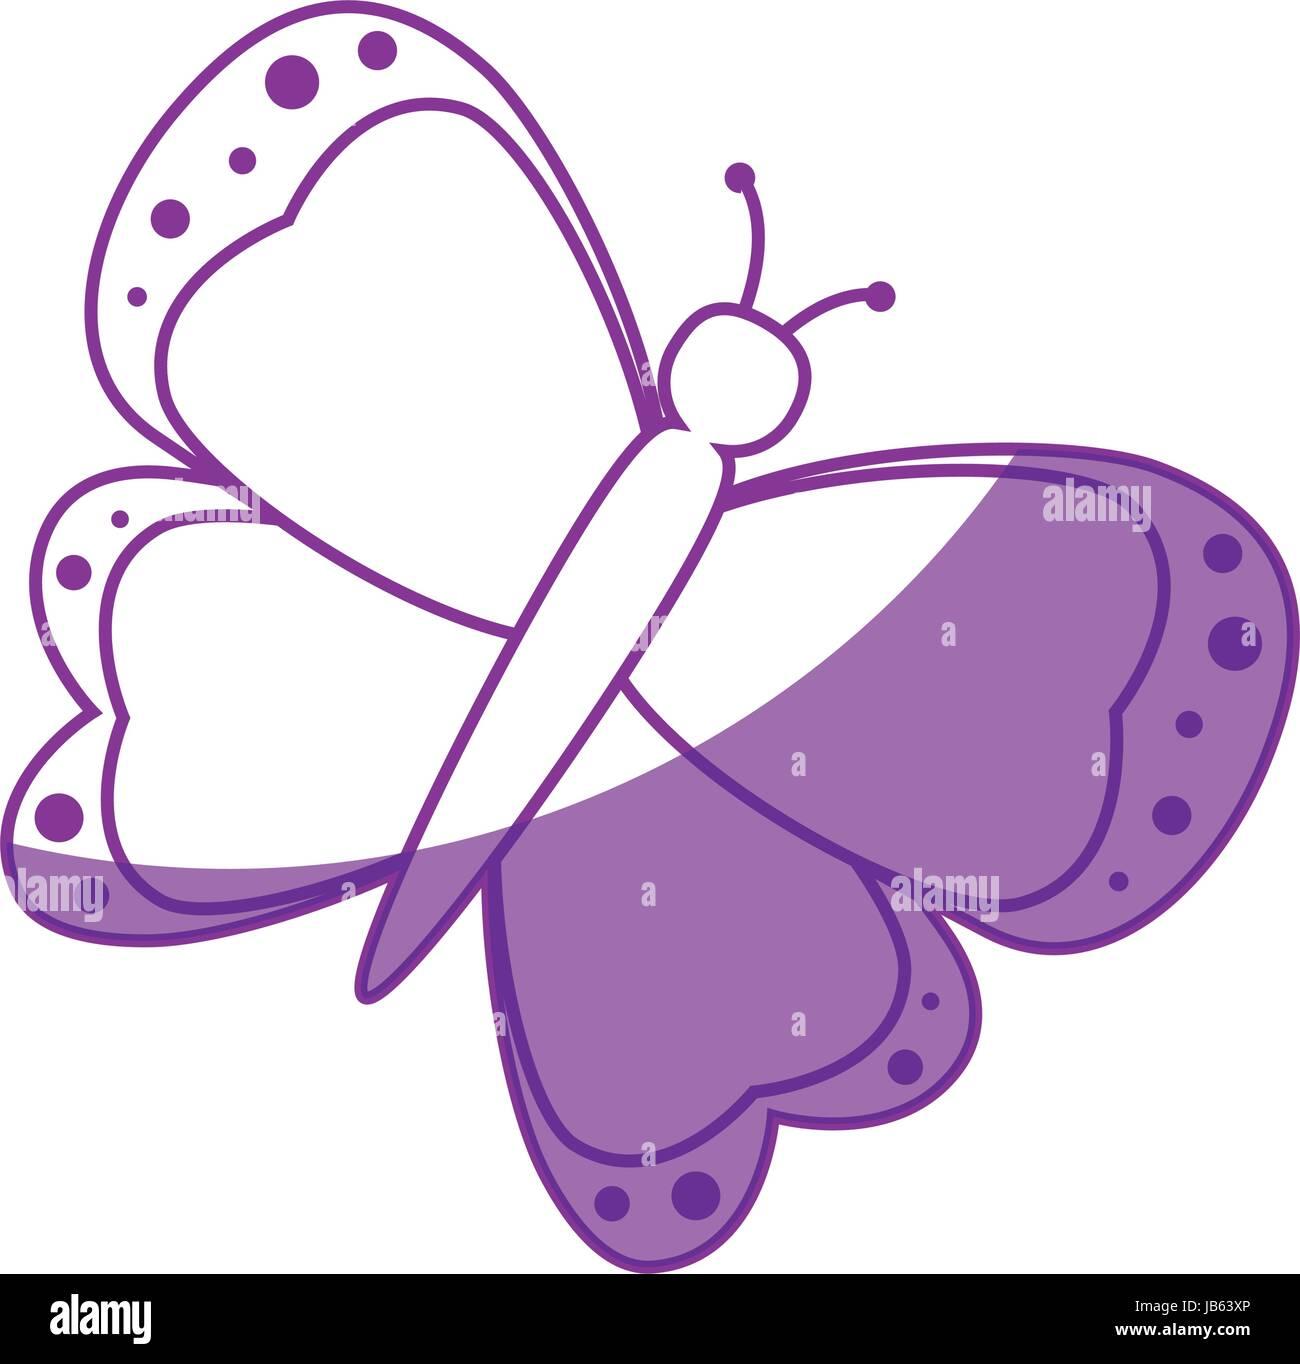 Butterfly Clip Stockfotos & Butterfly Clip Bilder - Seite 2 - Alamy